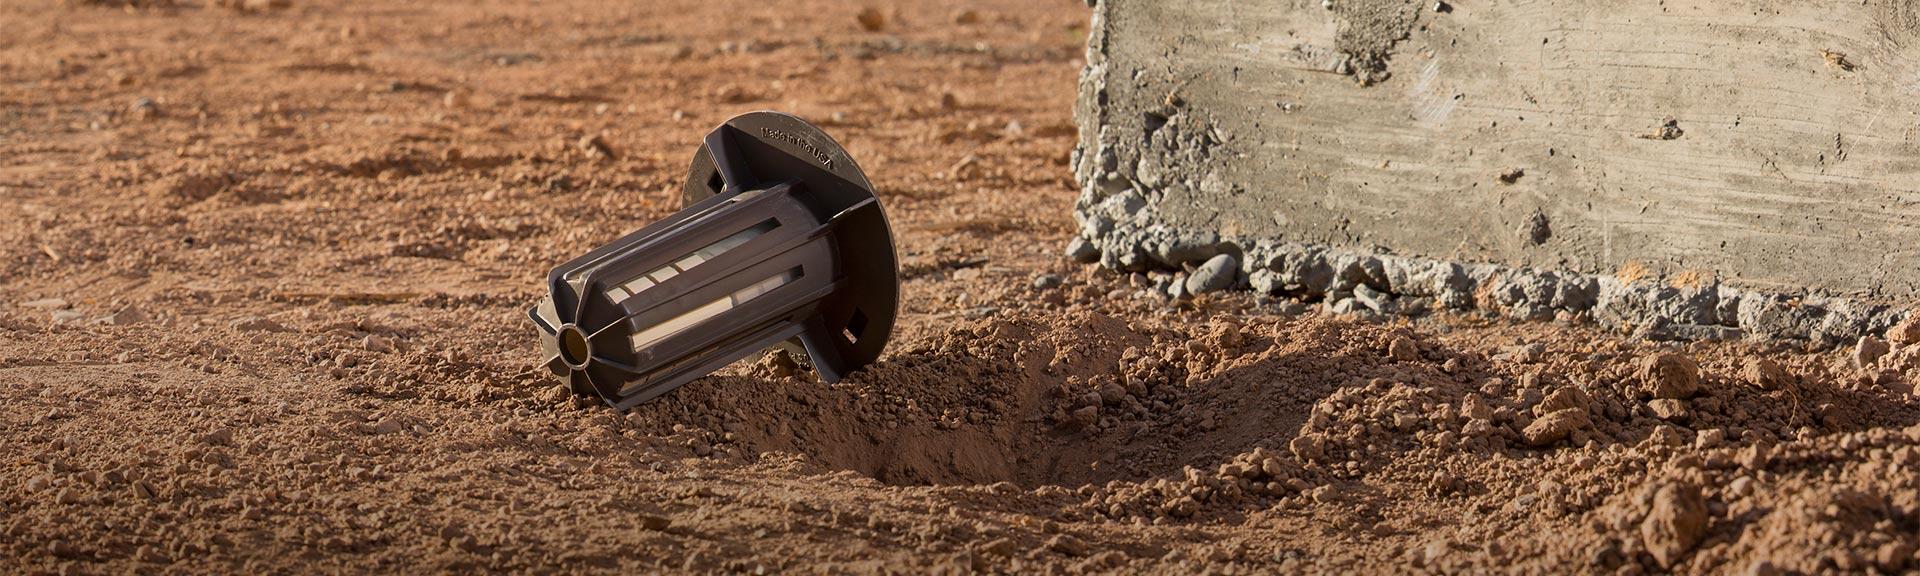 Basf Pest Control Solutions Termite Baits